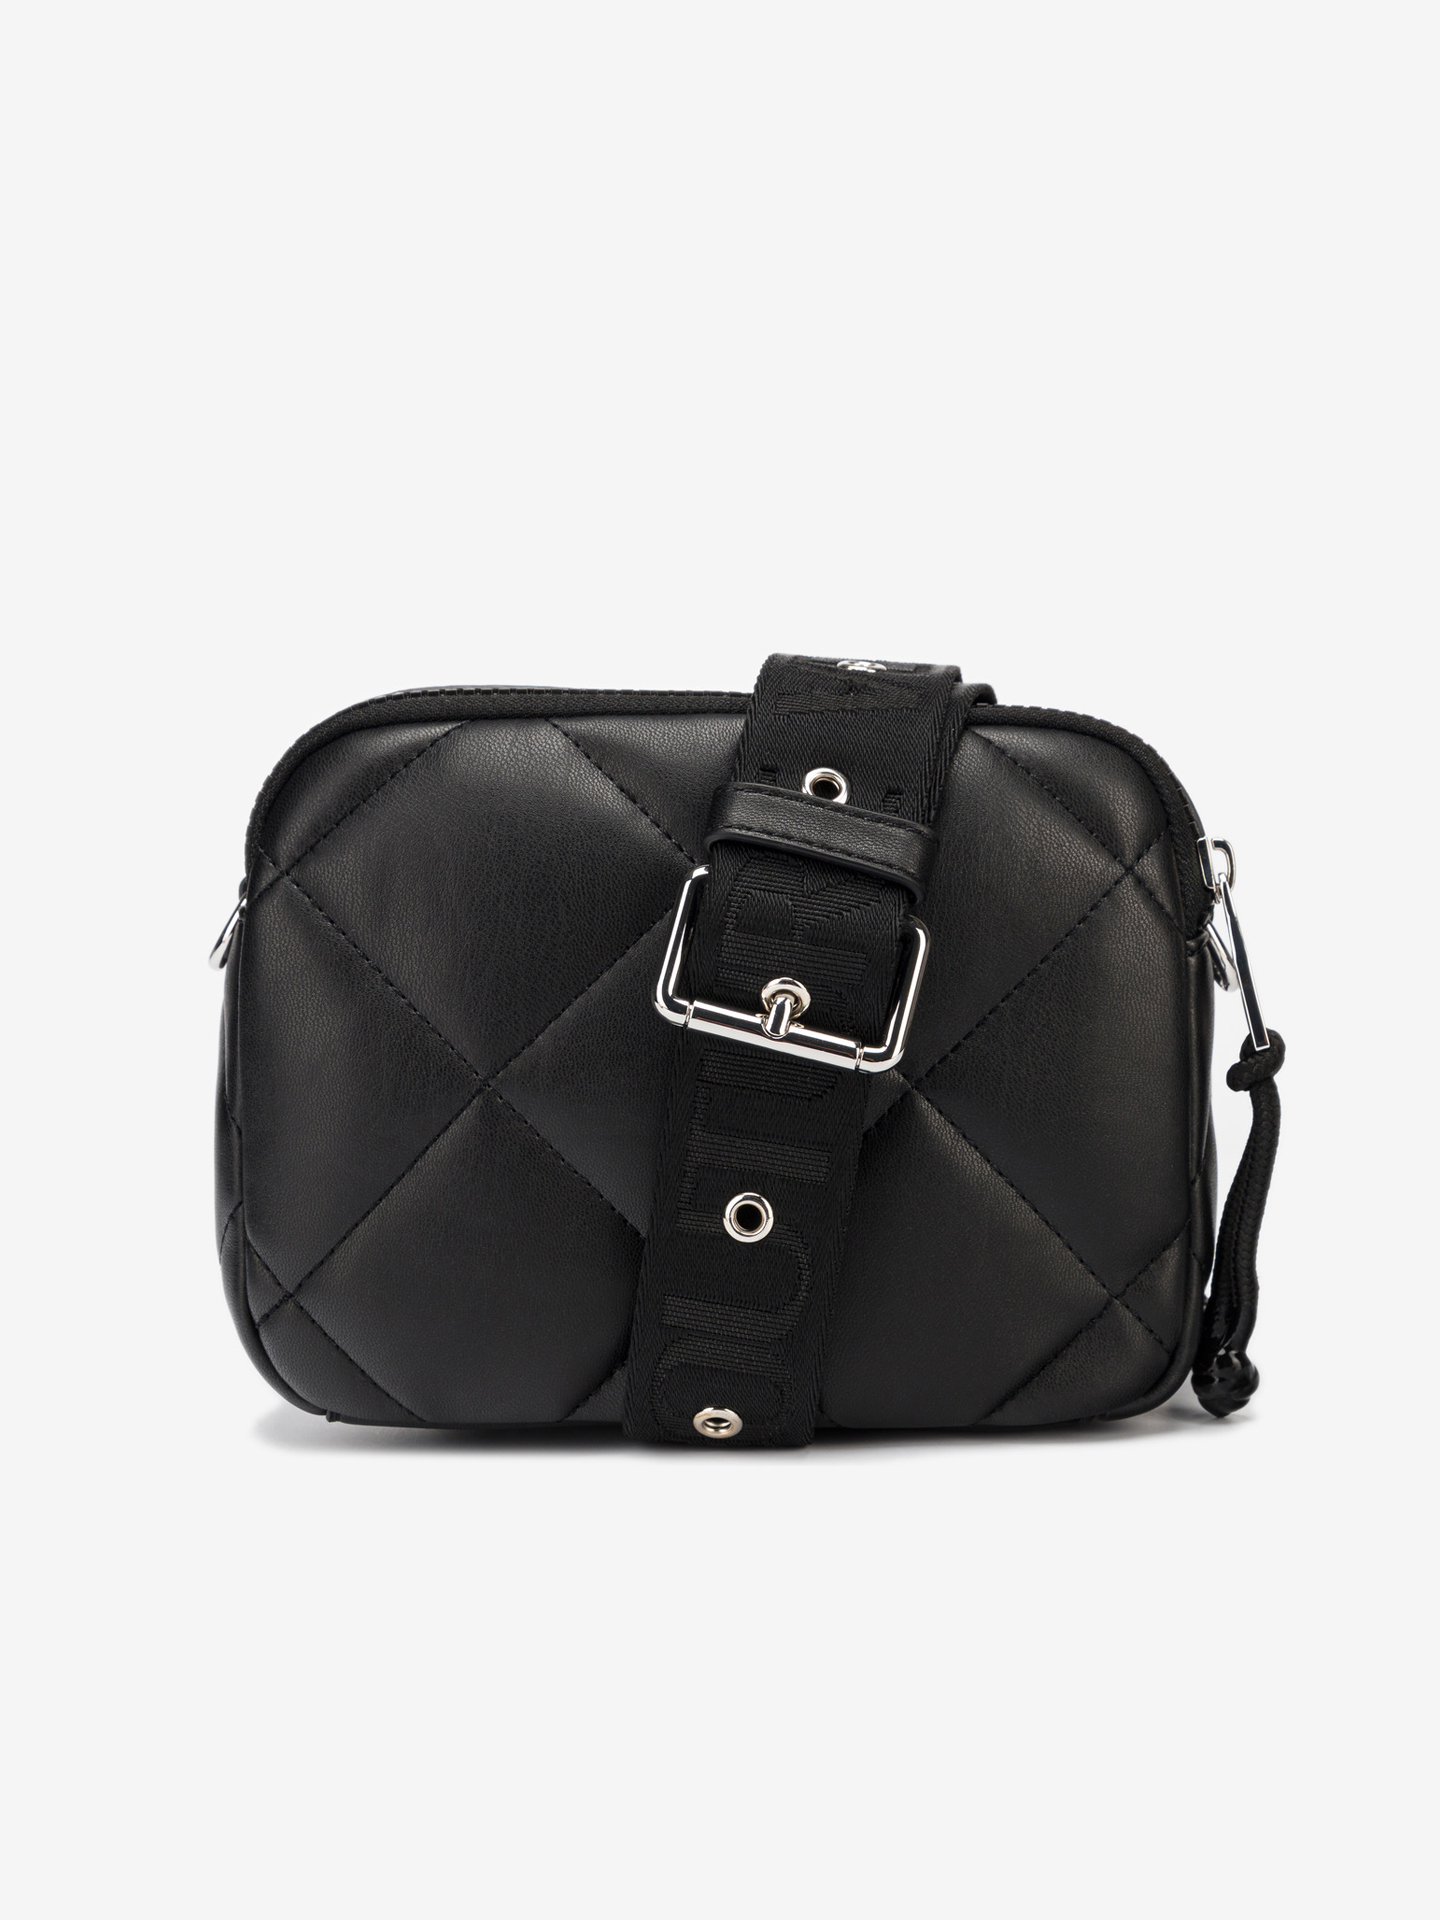 Versace Jeans Couture czarny crossbody torebka